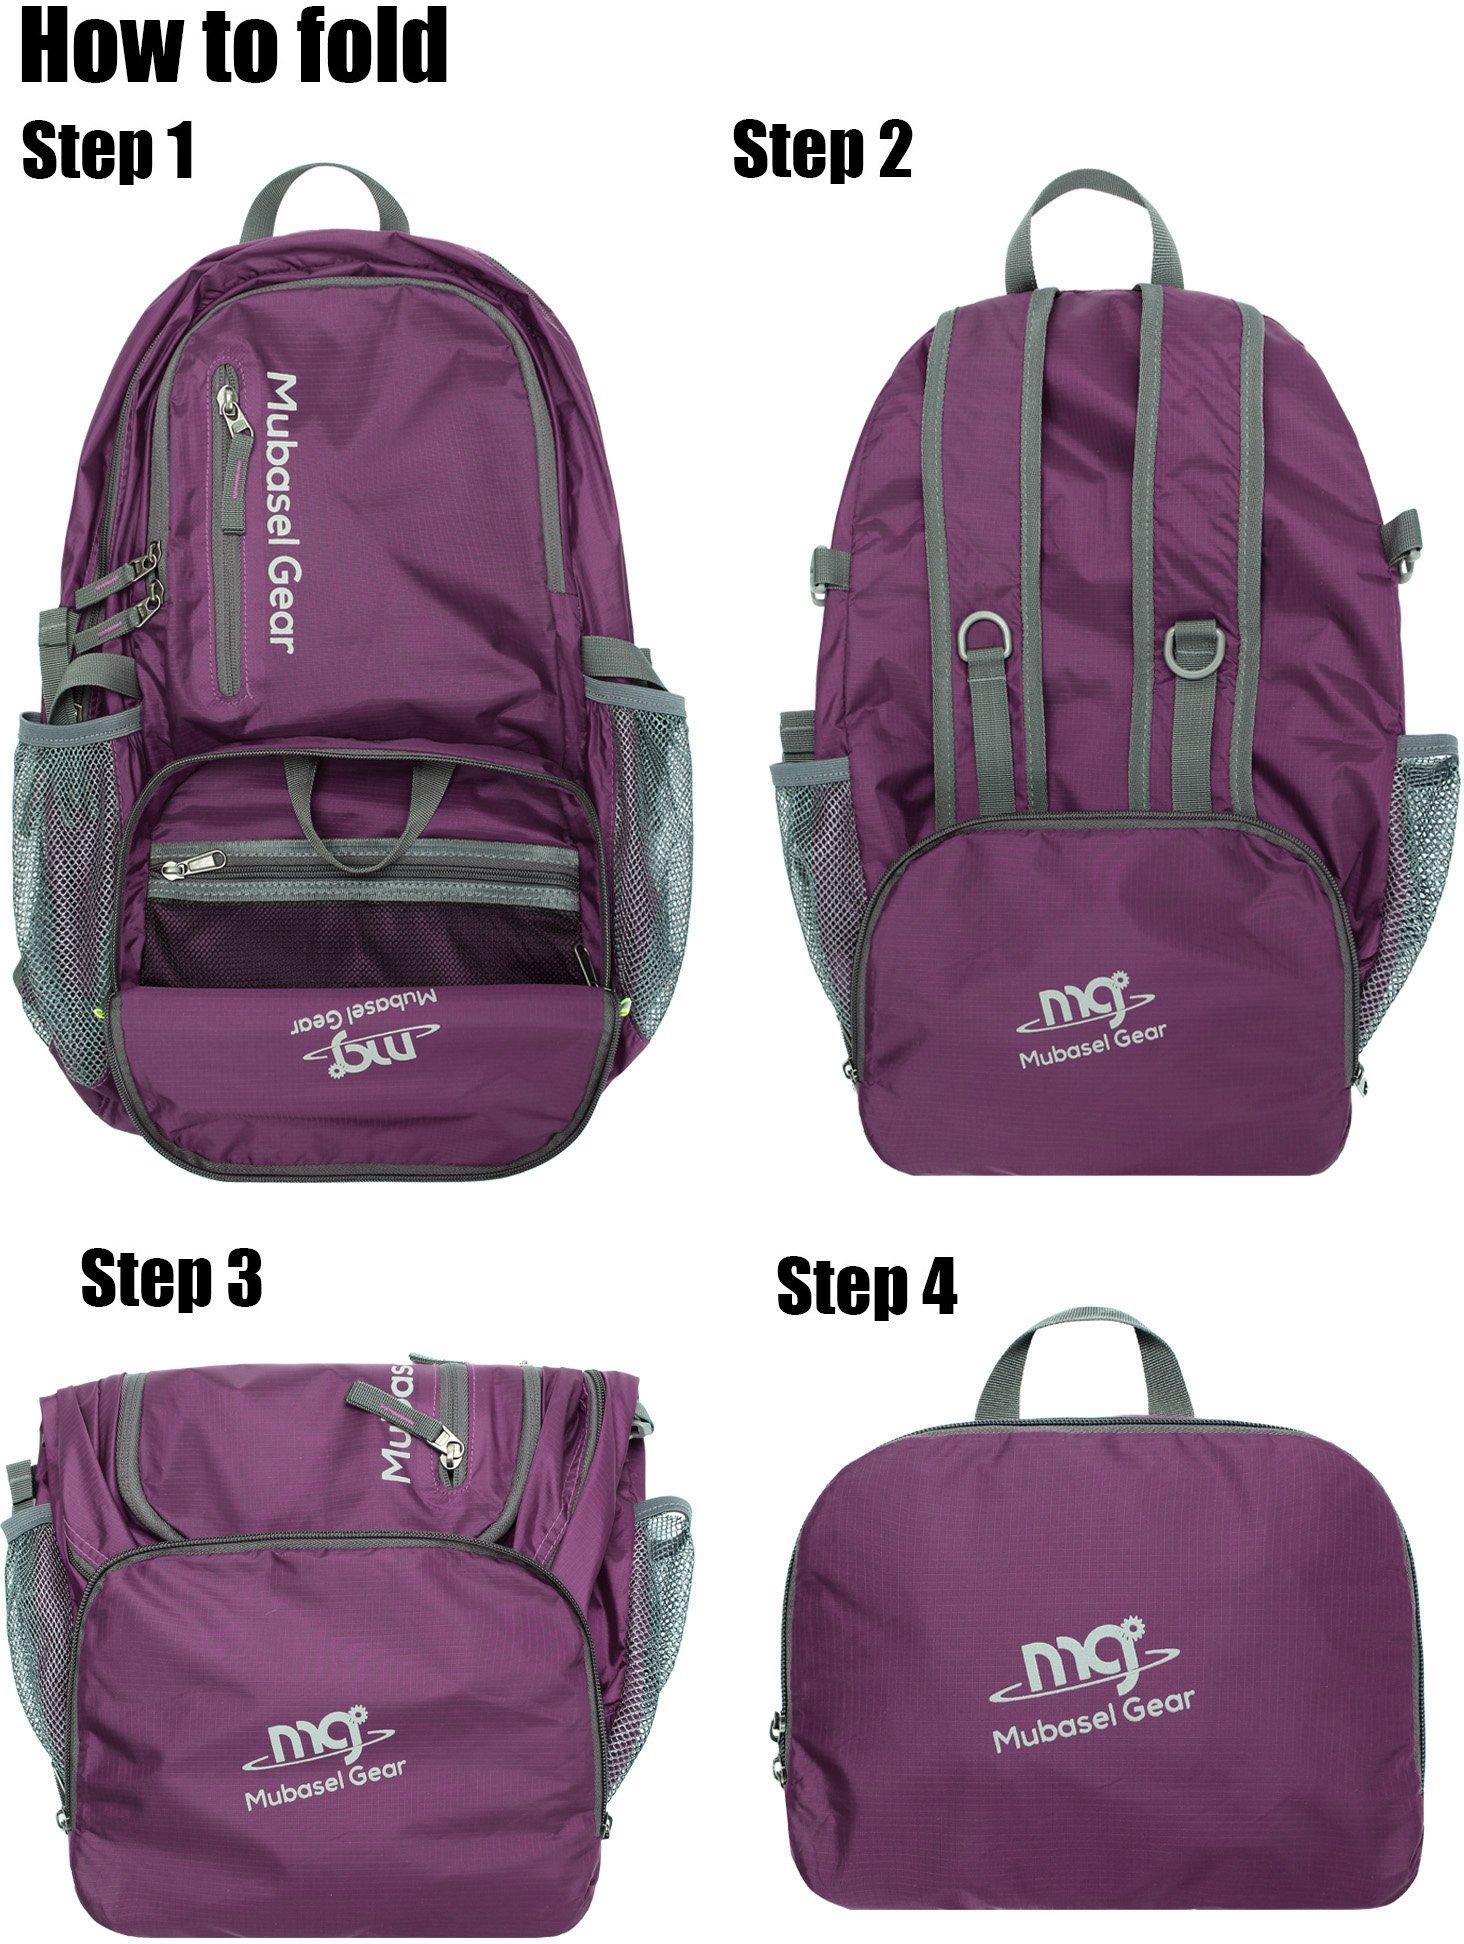 Mubasel Gear Backpack - Lightweight Backpacks for Travel Hiking - Daypack for Women Men (Purple) by Mubasel Gear (Image #6)